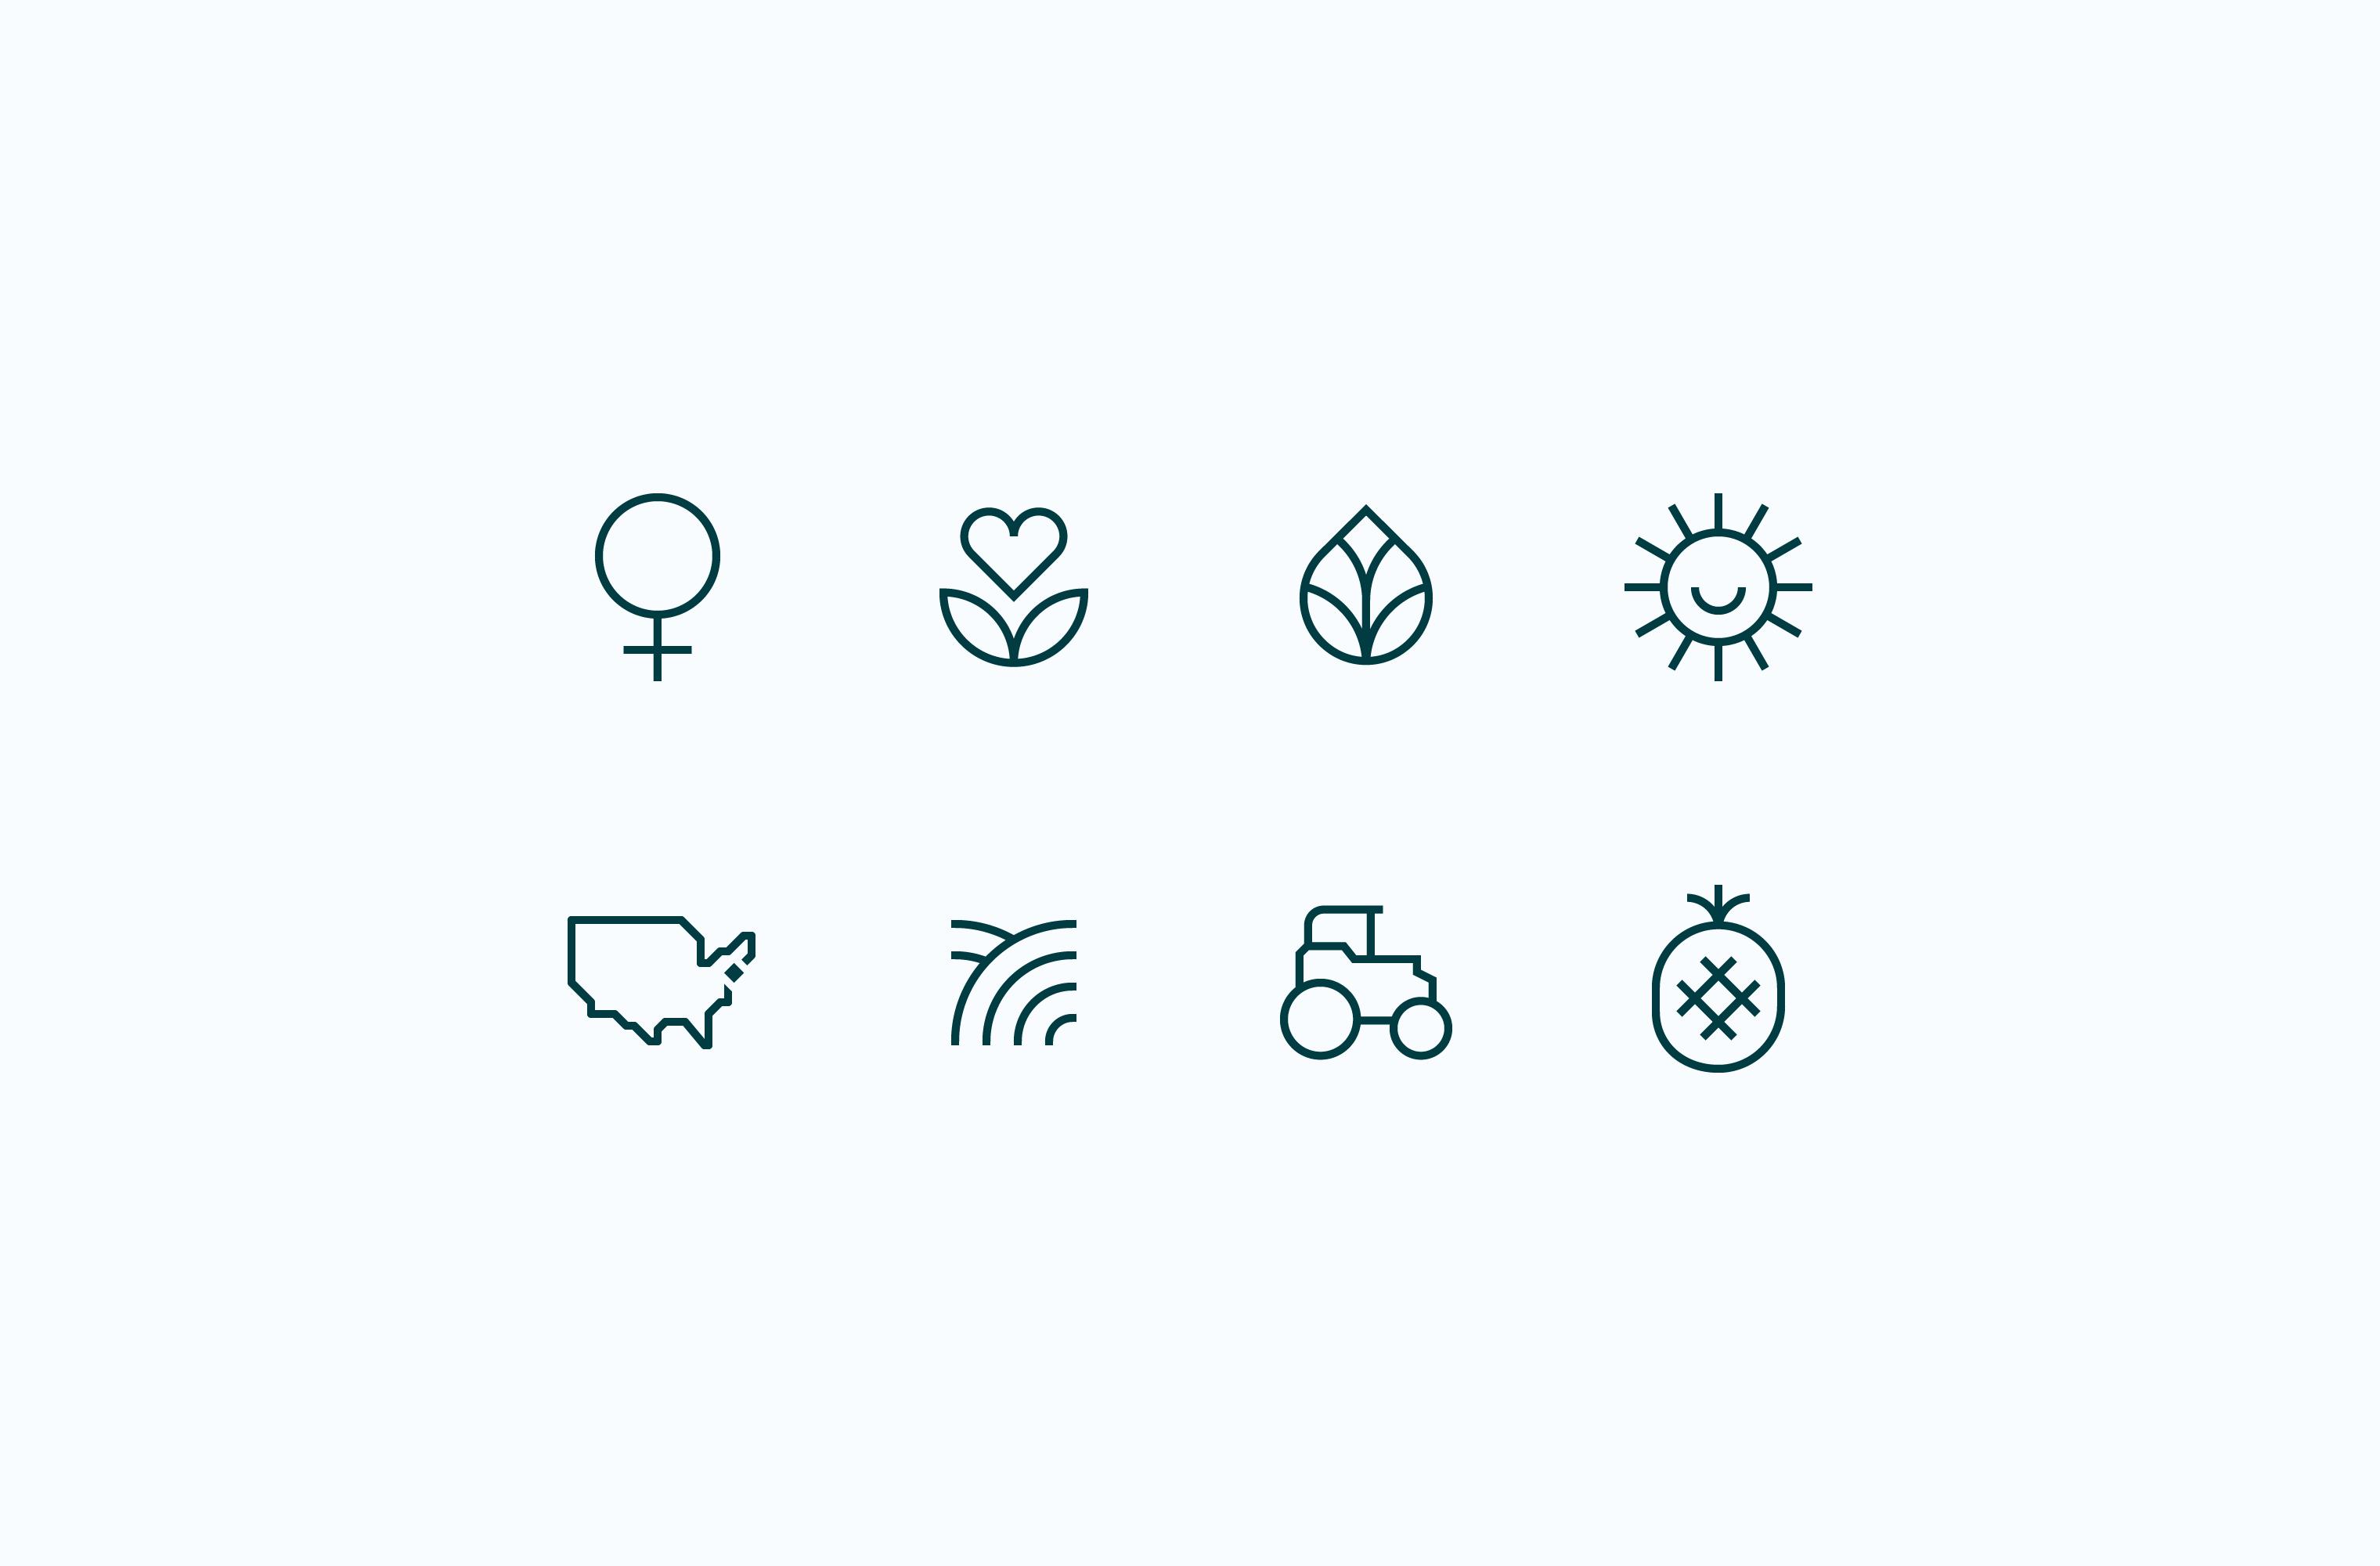 Grazy brand values icon set